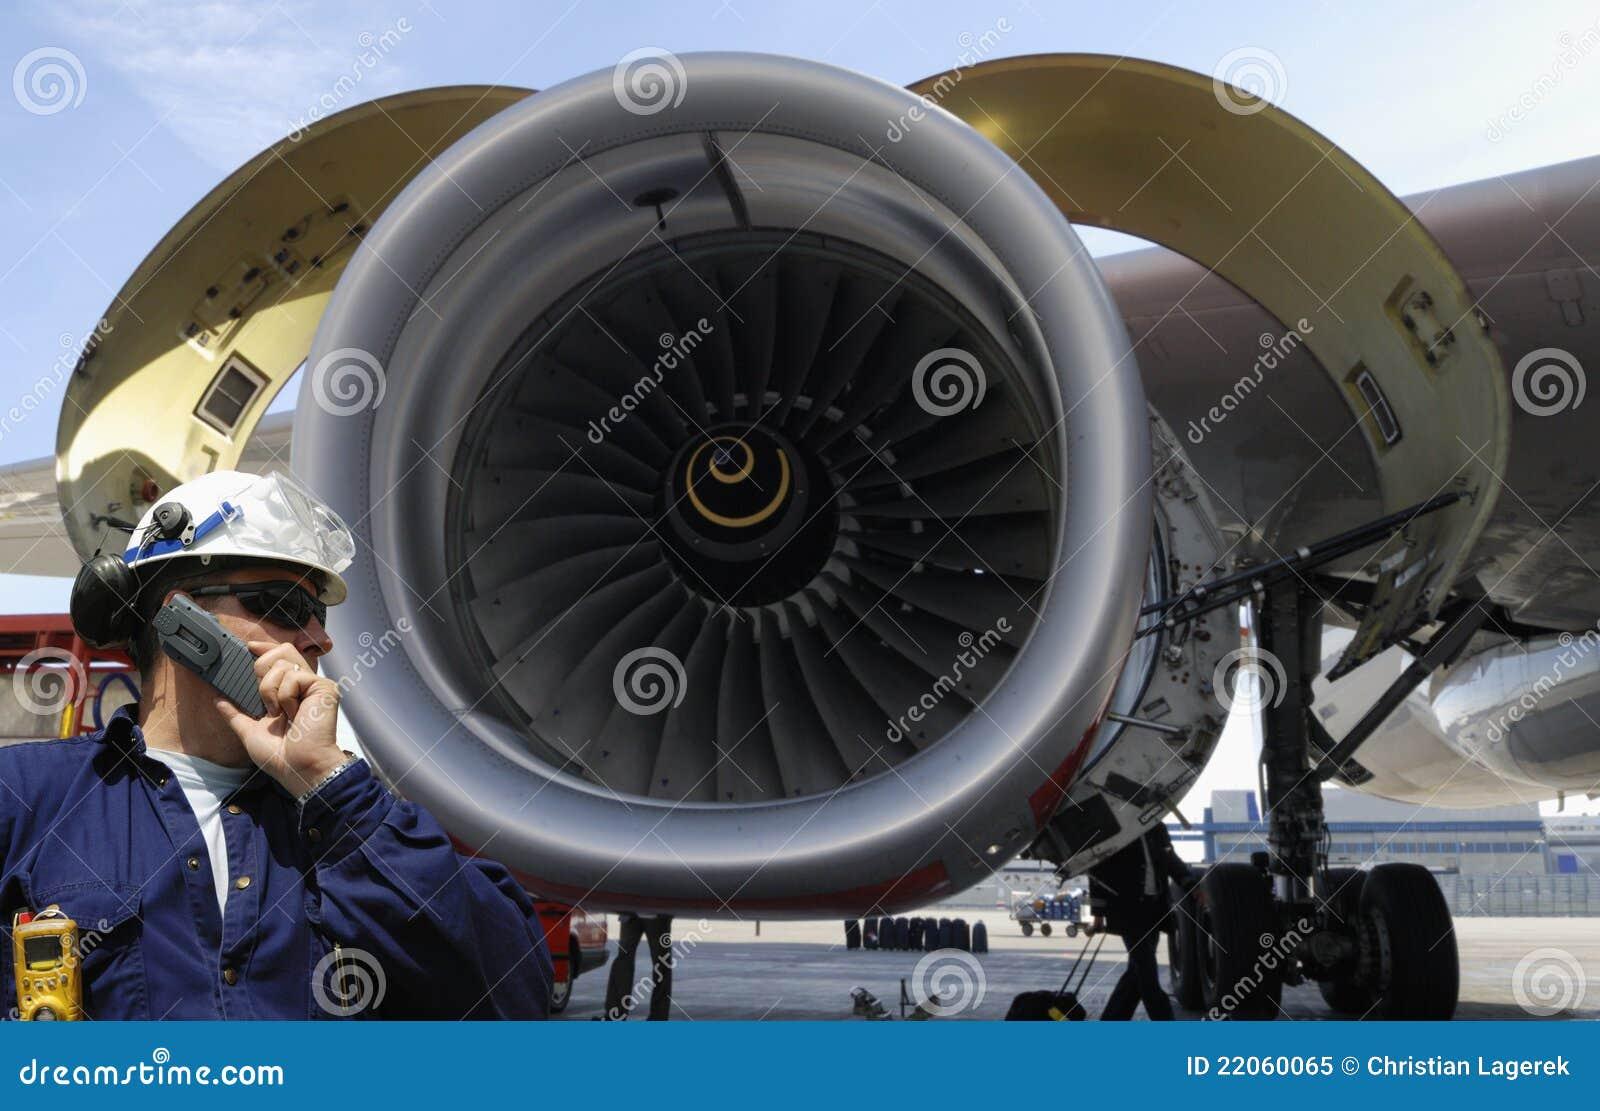 airplane mechanic and jet engine royalty free stock photo